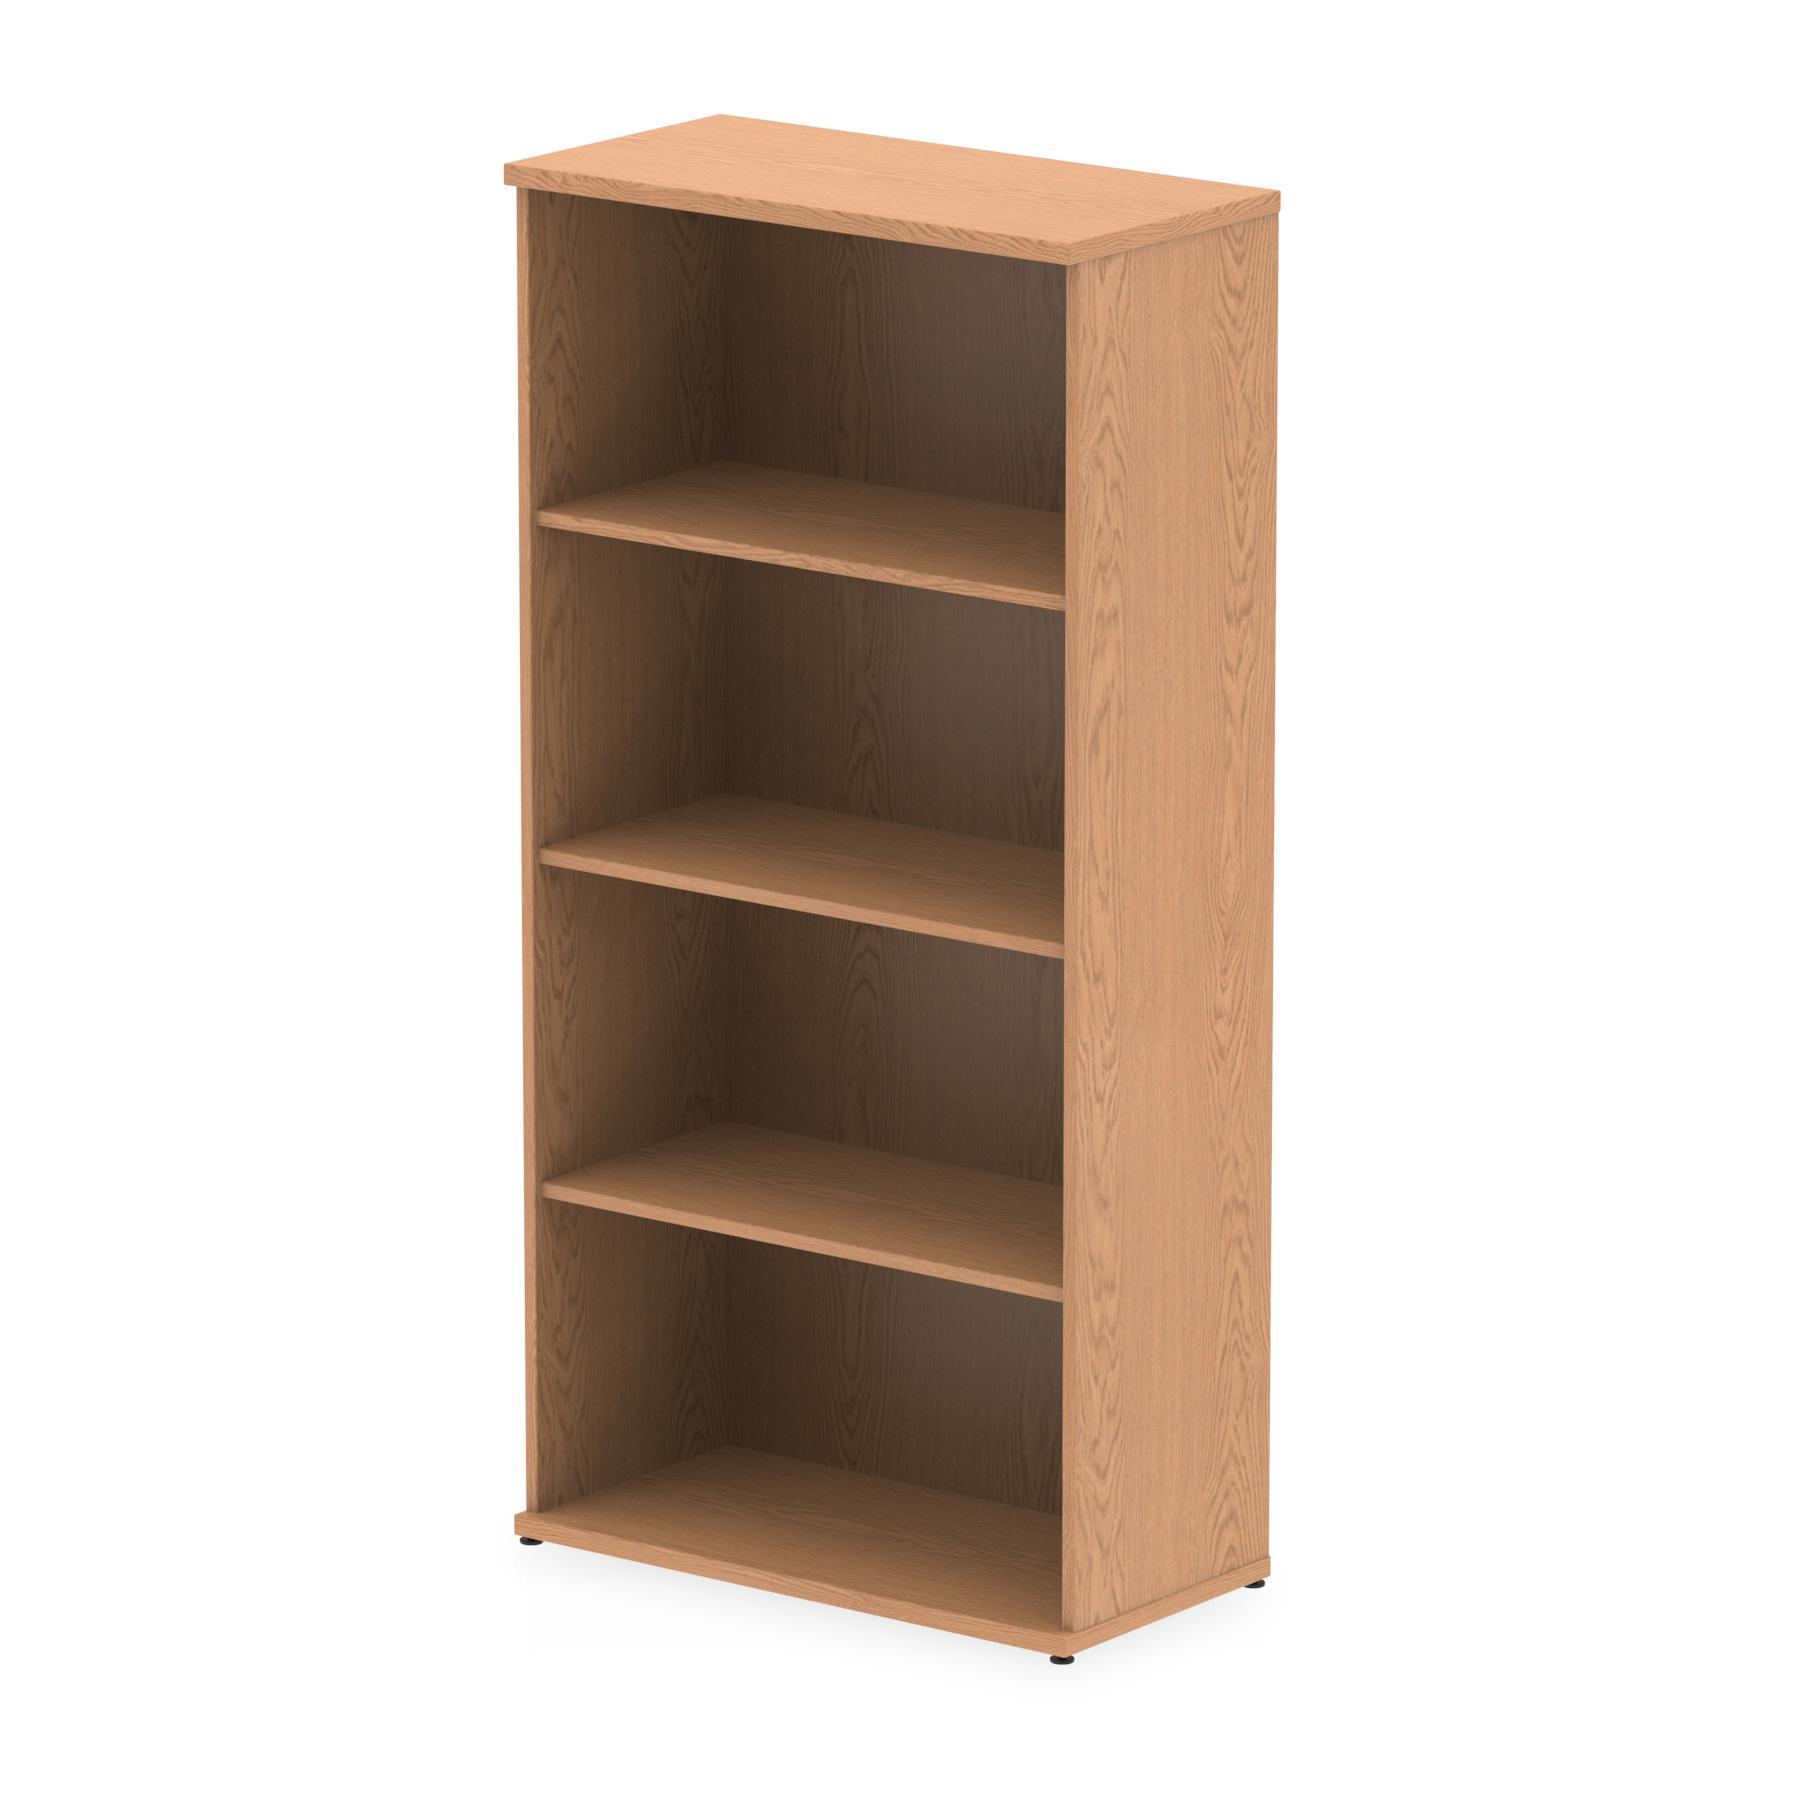 Over 1200mm High Impulse 1600mm Bookcase Oak I000759